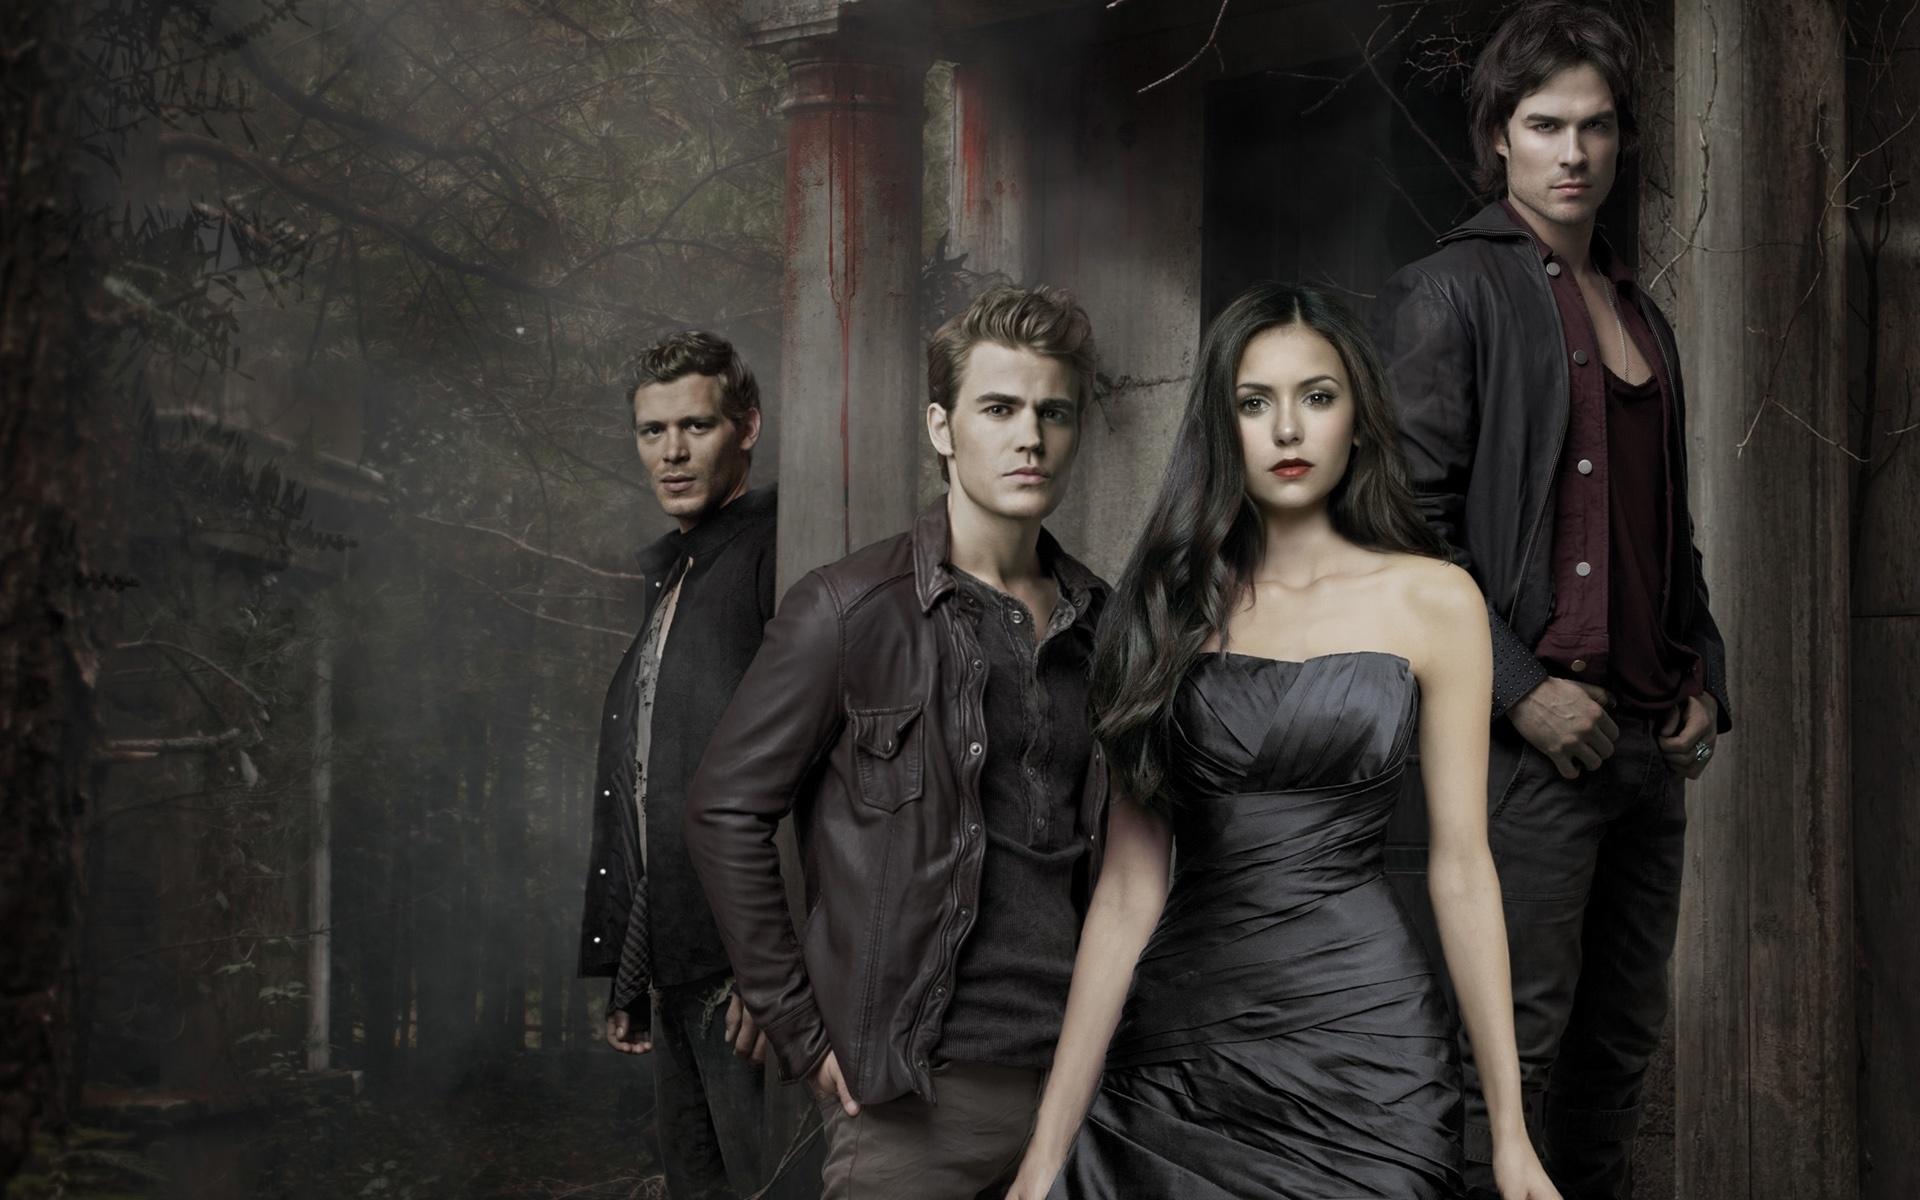 vampire diaries characters - HD1920×1080